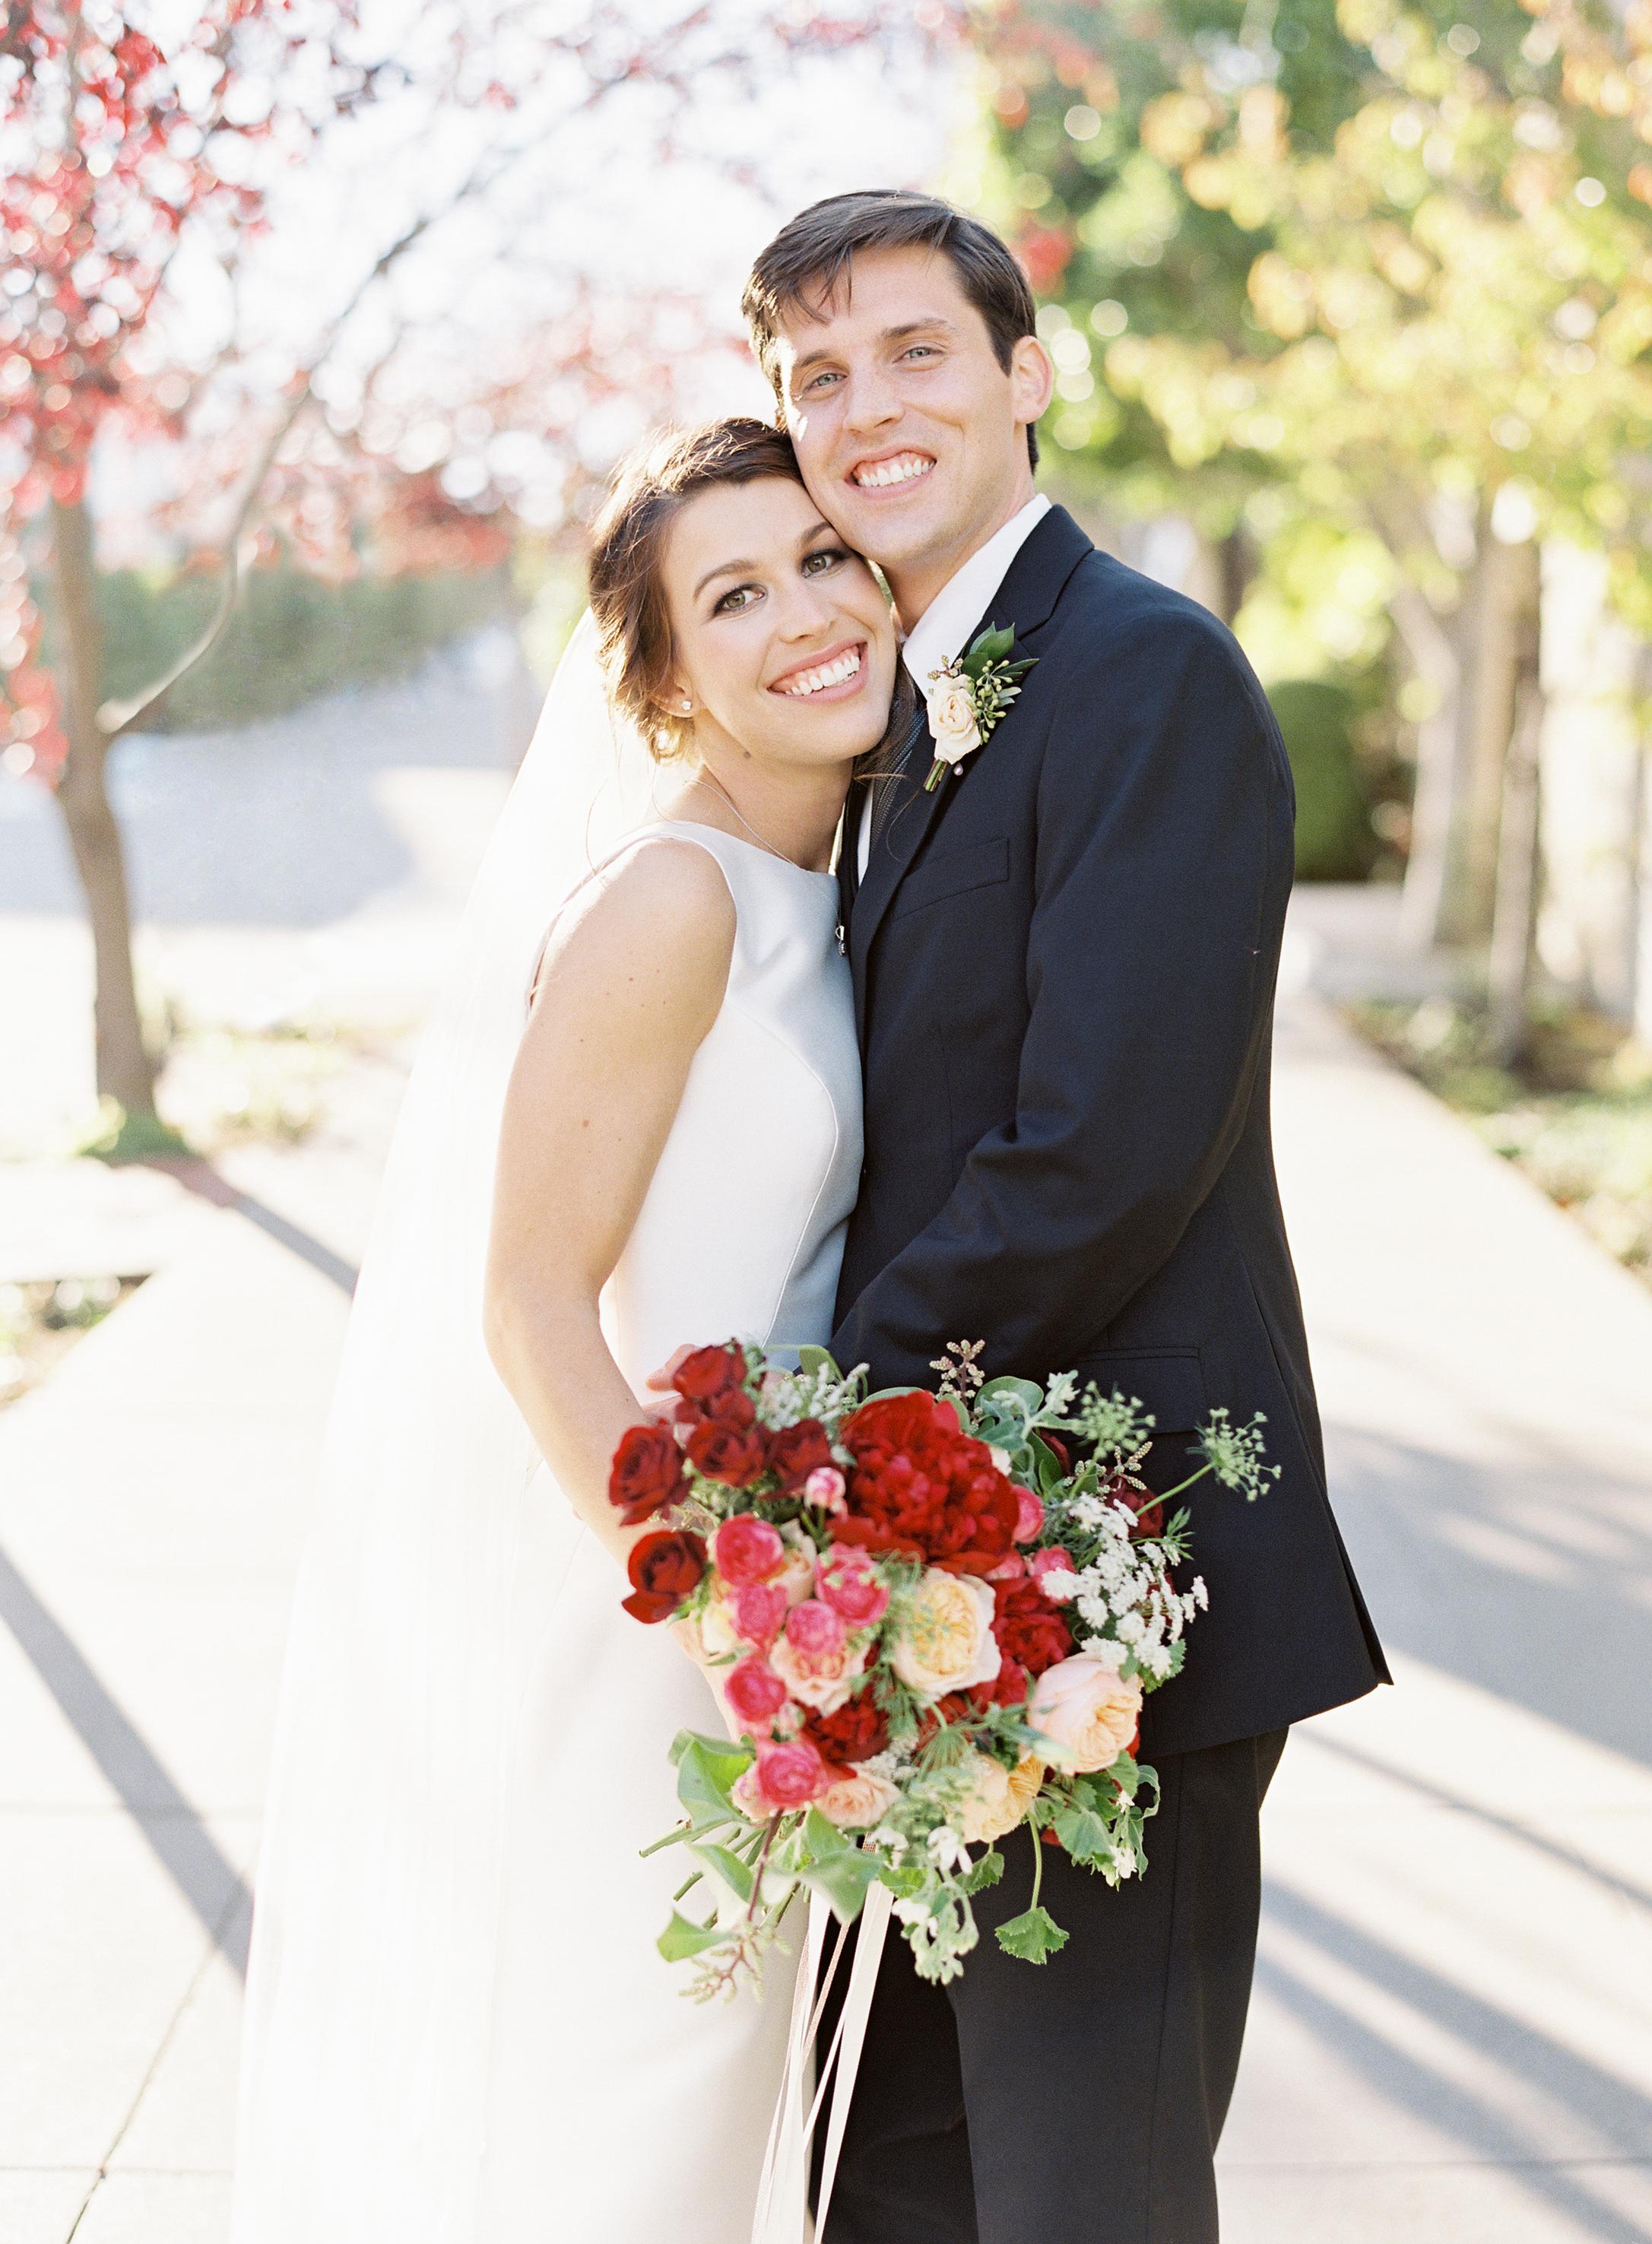 Meghan Mehan Photography - California Wedding Photographer | San Francisco City Hall Wedding 057.jpg